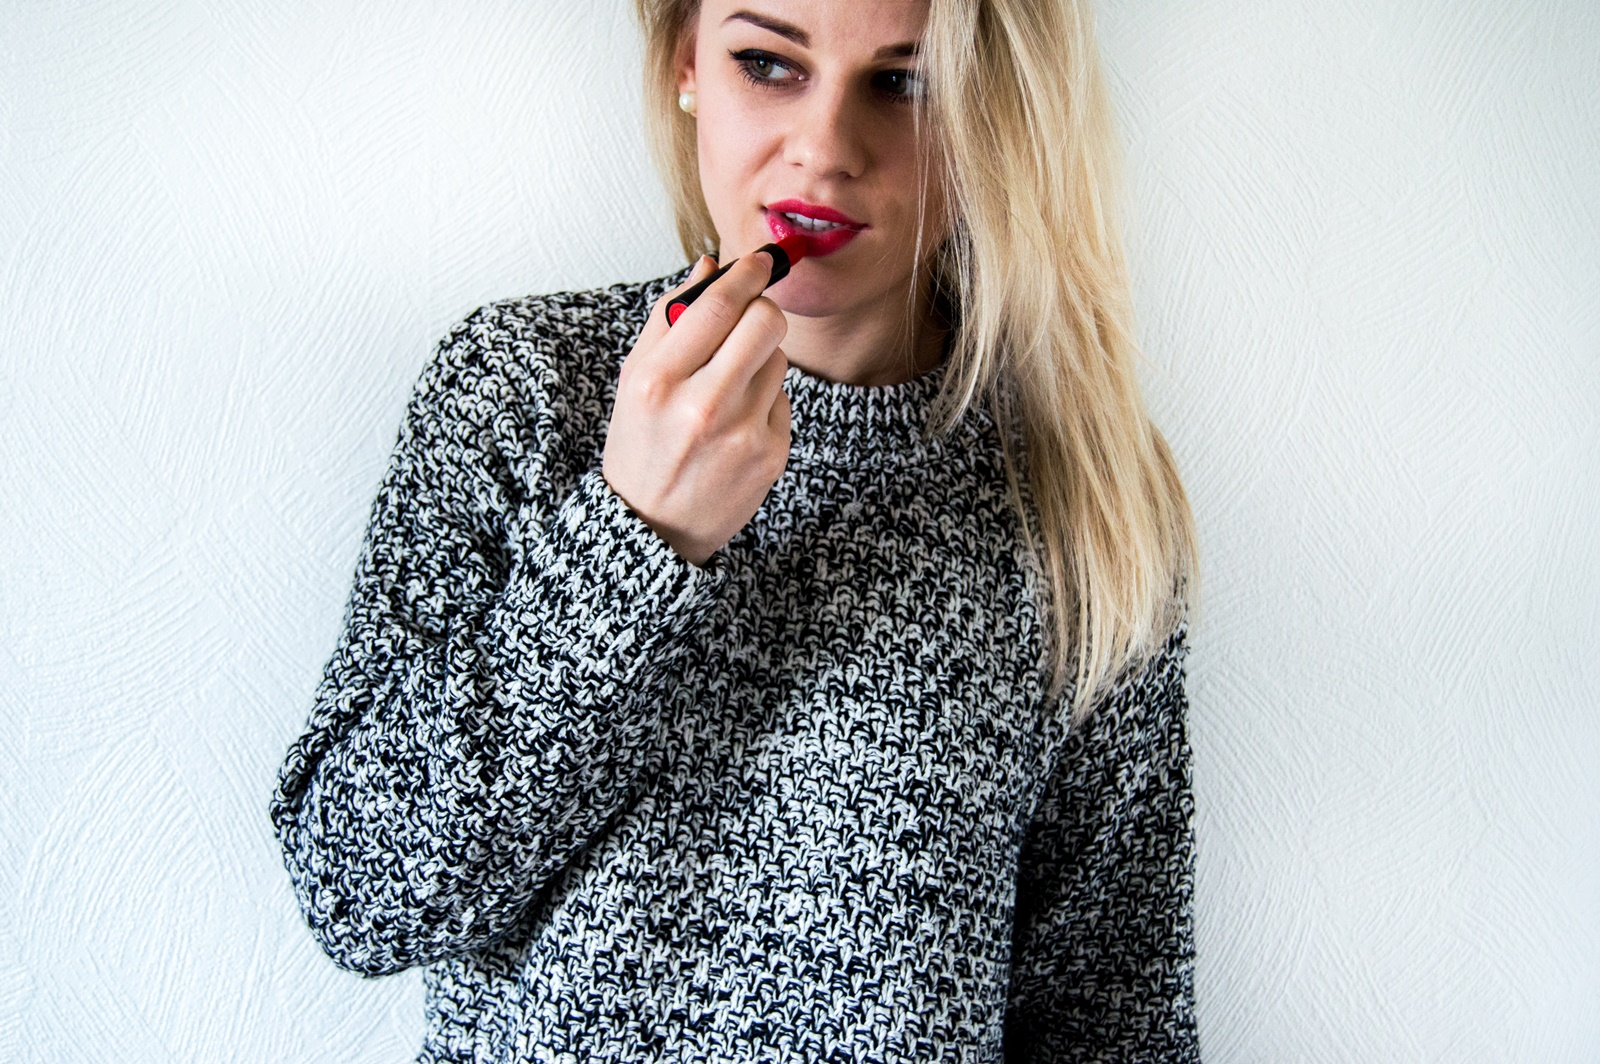 Sweater weather – Eat Make Up Dress